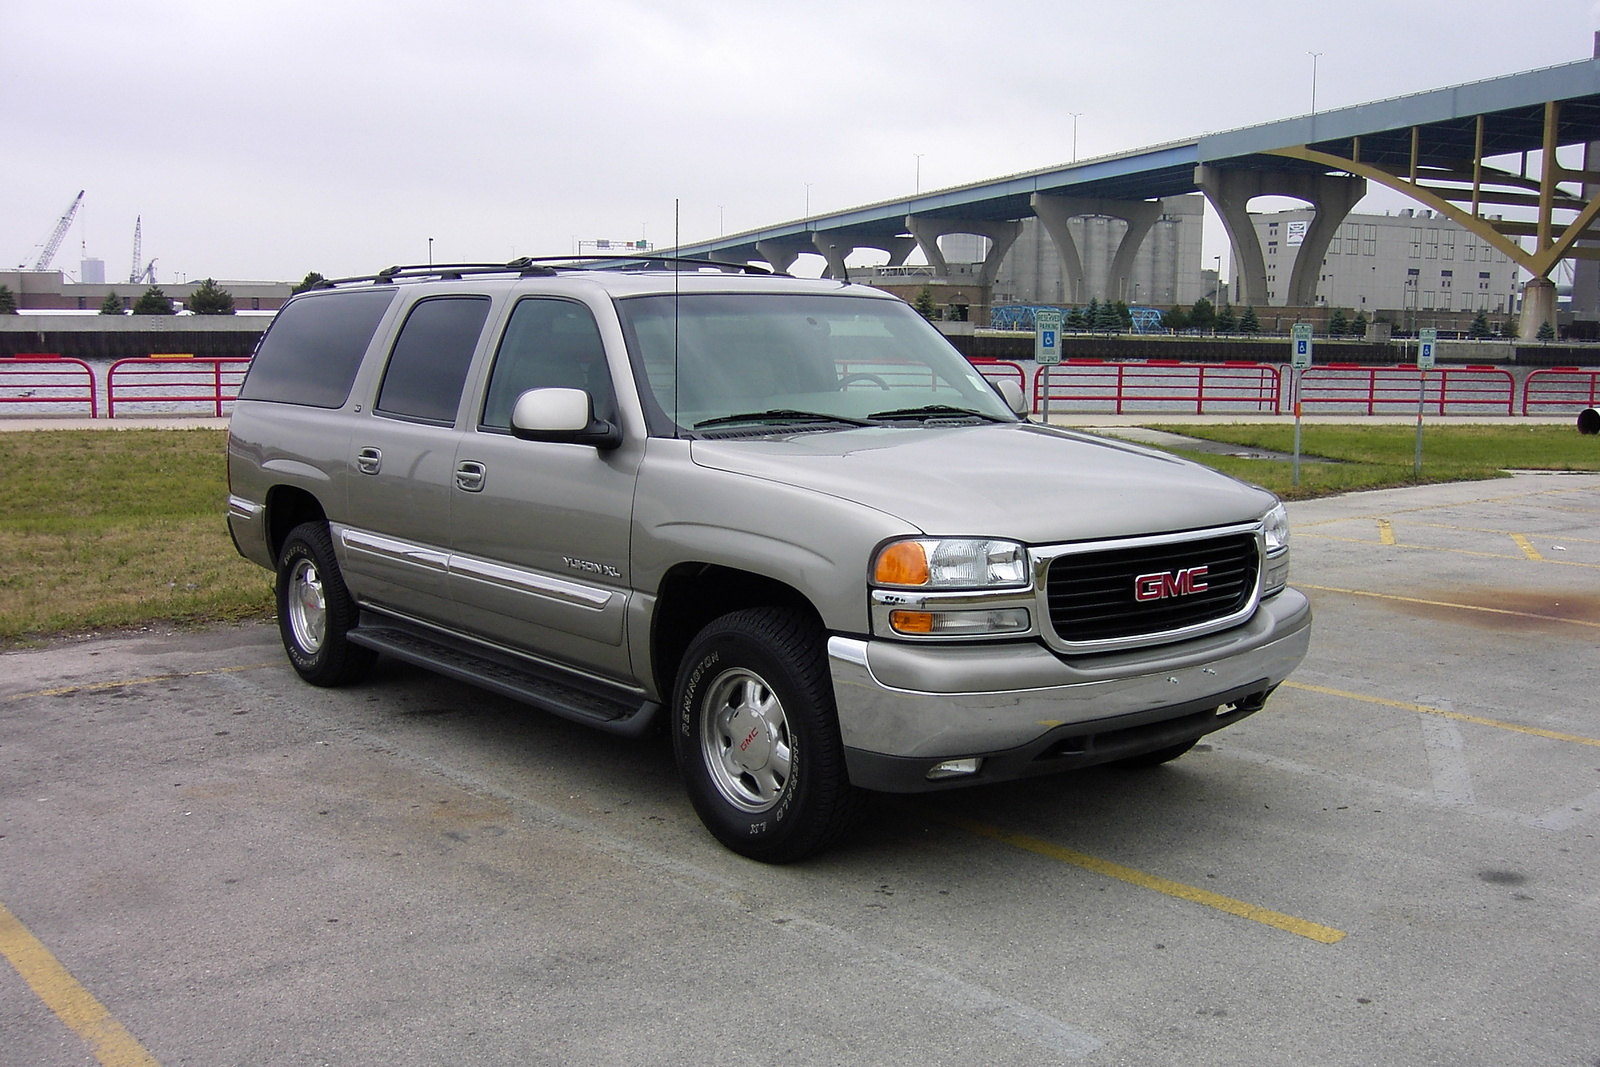 Chevy Yukon Vs Tahoe >> 2005 GMC Yukon XL - Overview - CarGurus